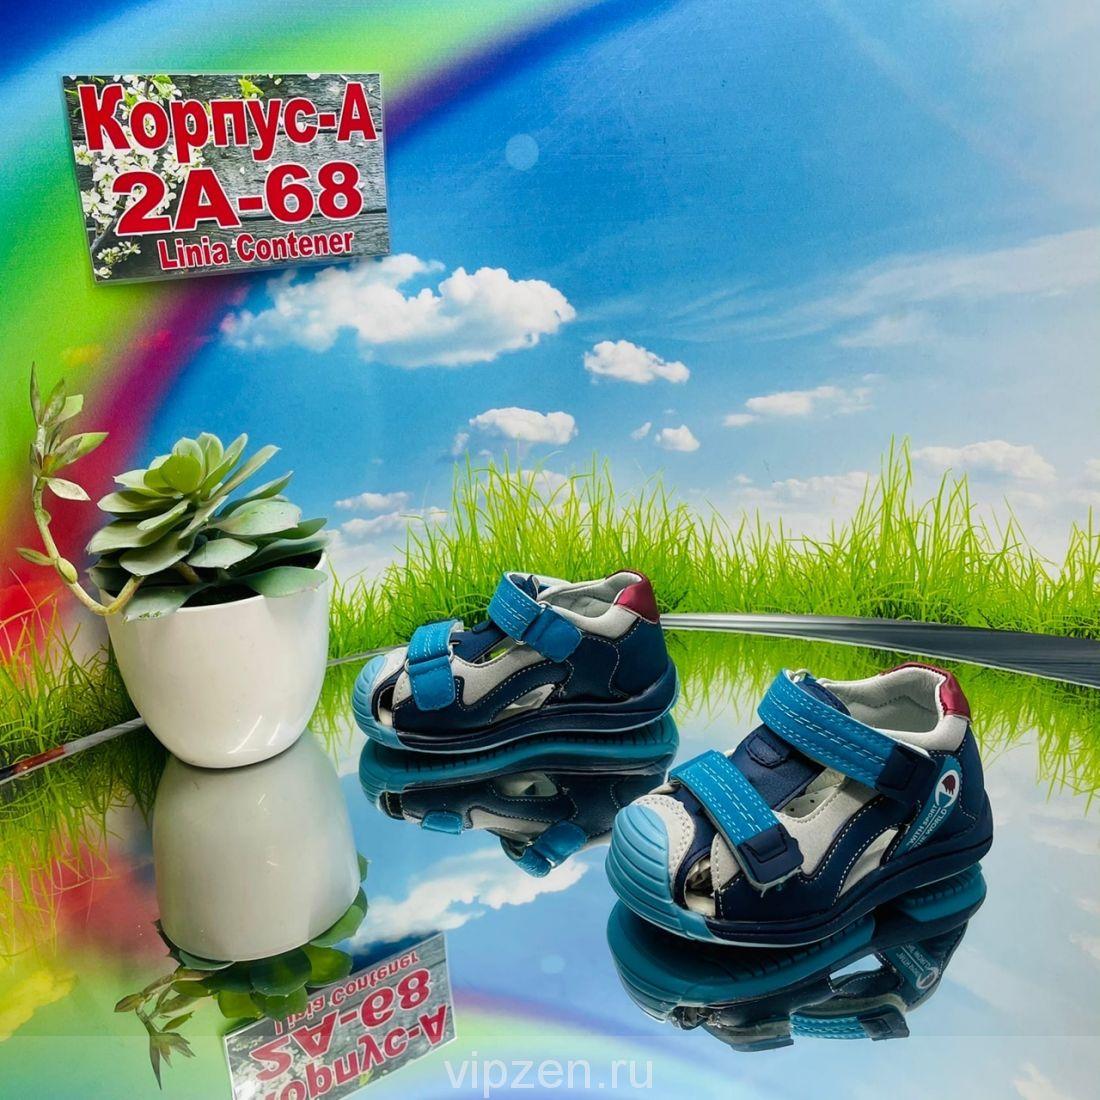 ТК Садовод а 2а-68